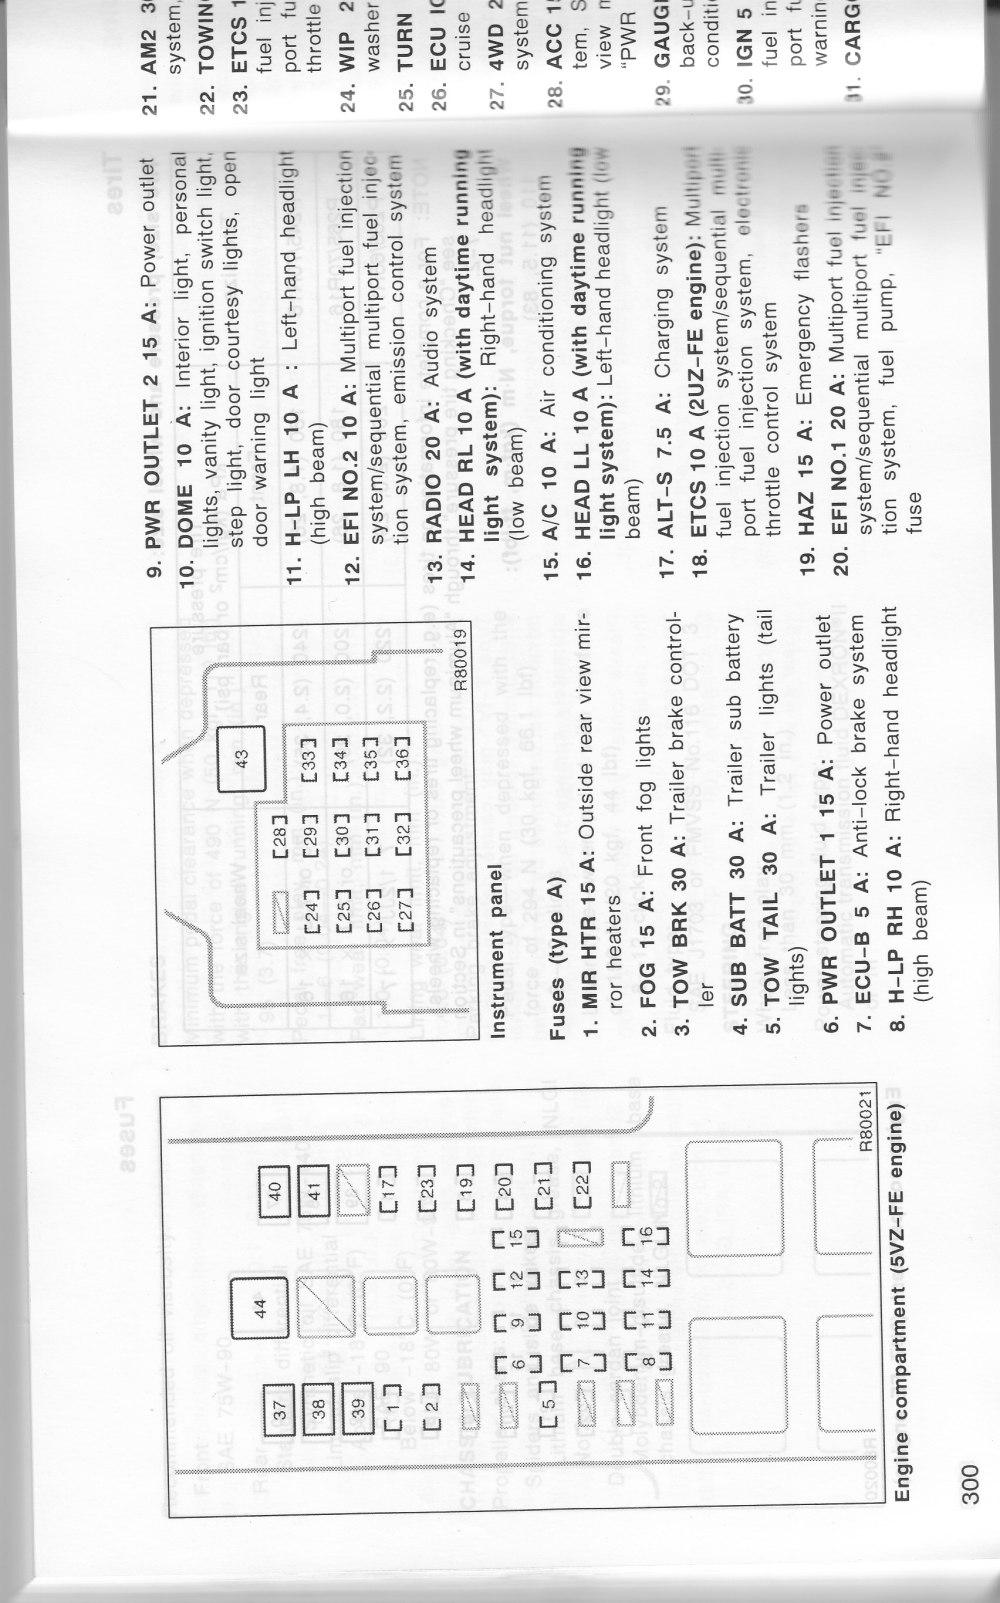 medium resolution of toyota tundra sr5 hi ivan i have exactly the same issue with 2004 toyota tundra fuse diagram 2002 toyota tundra fuse box location